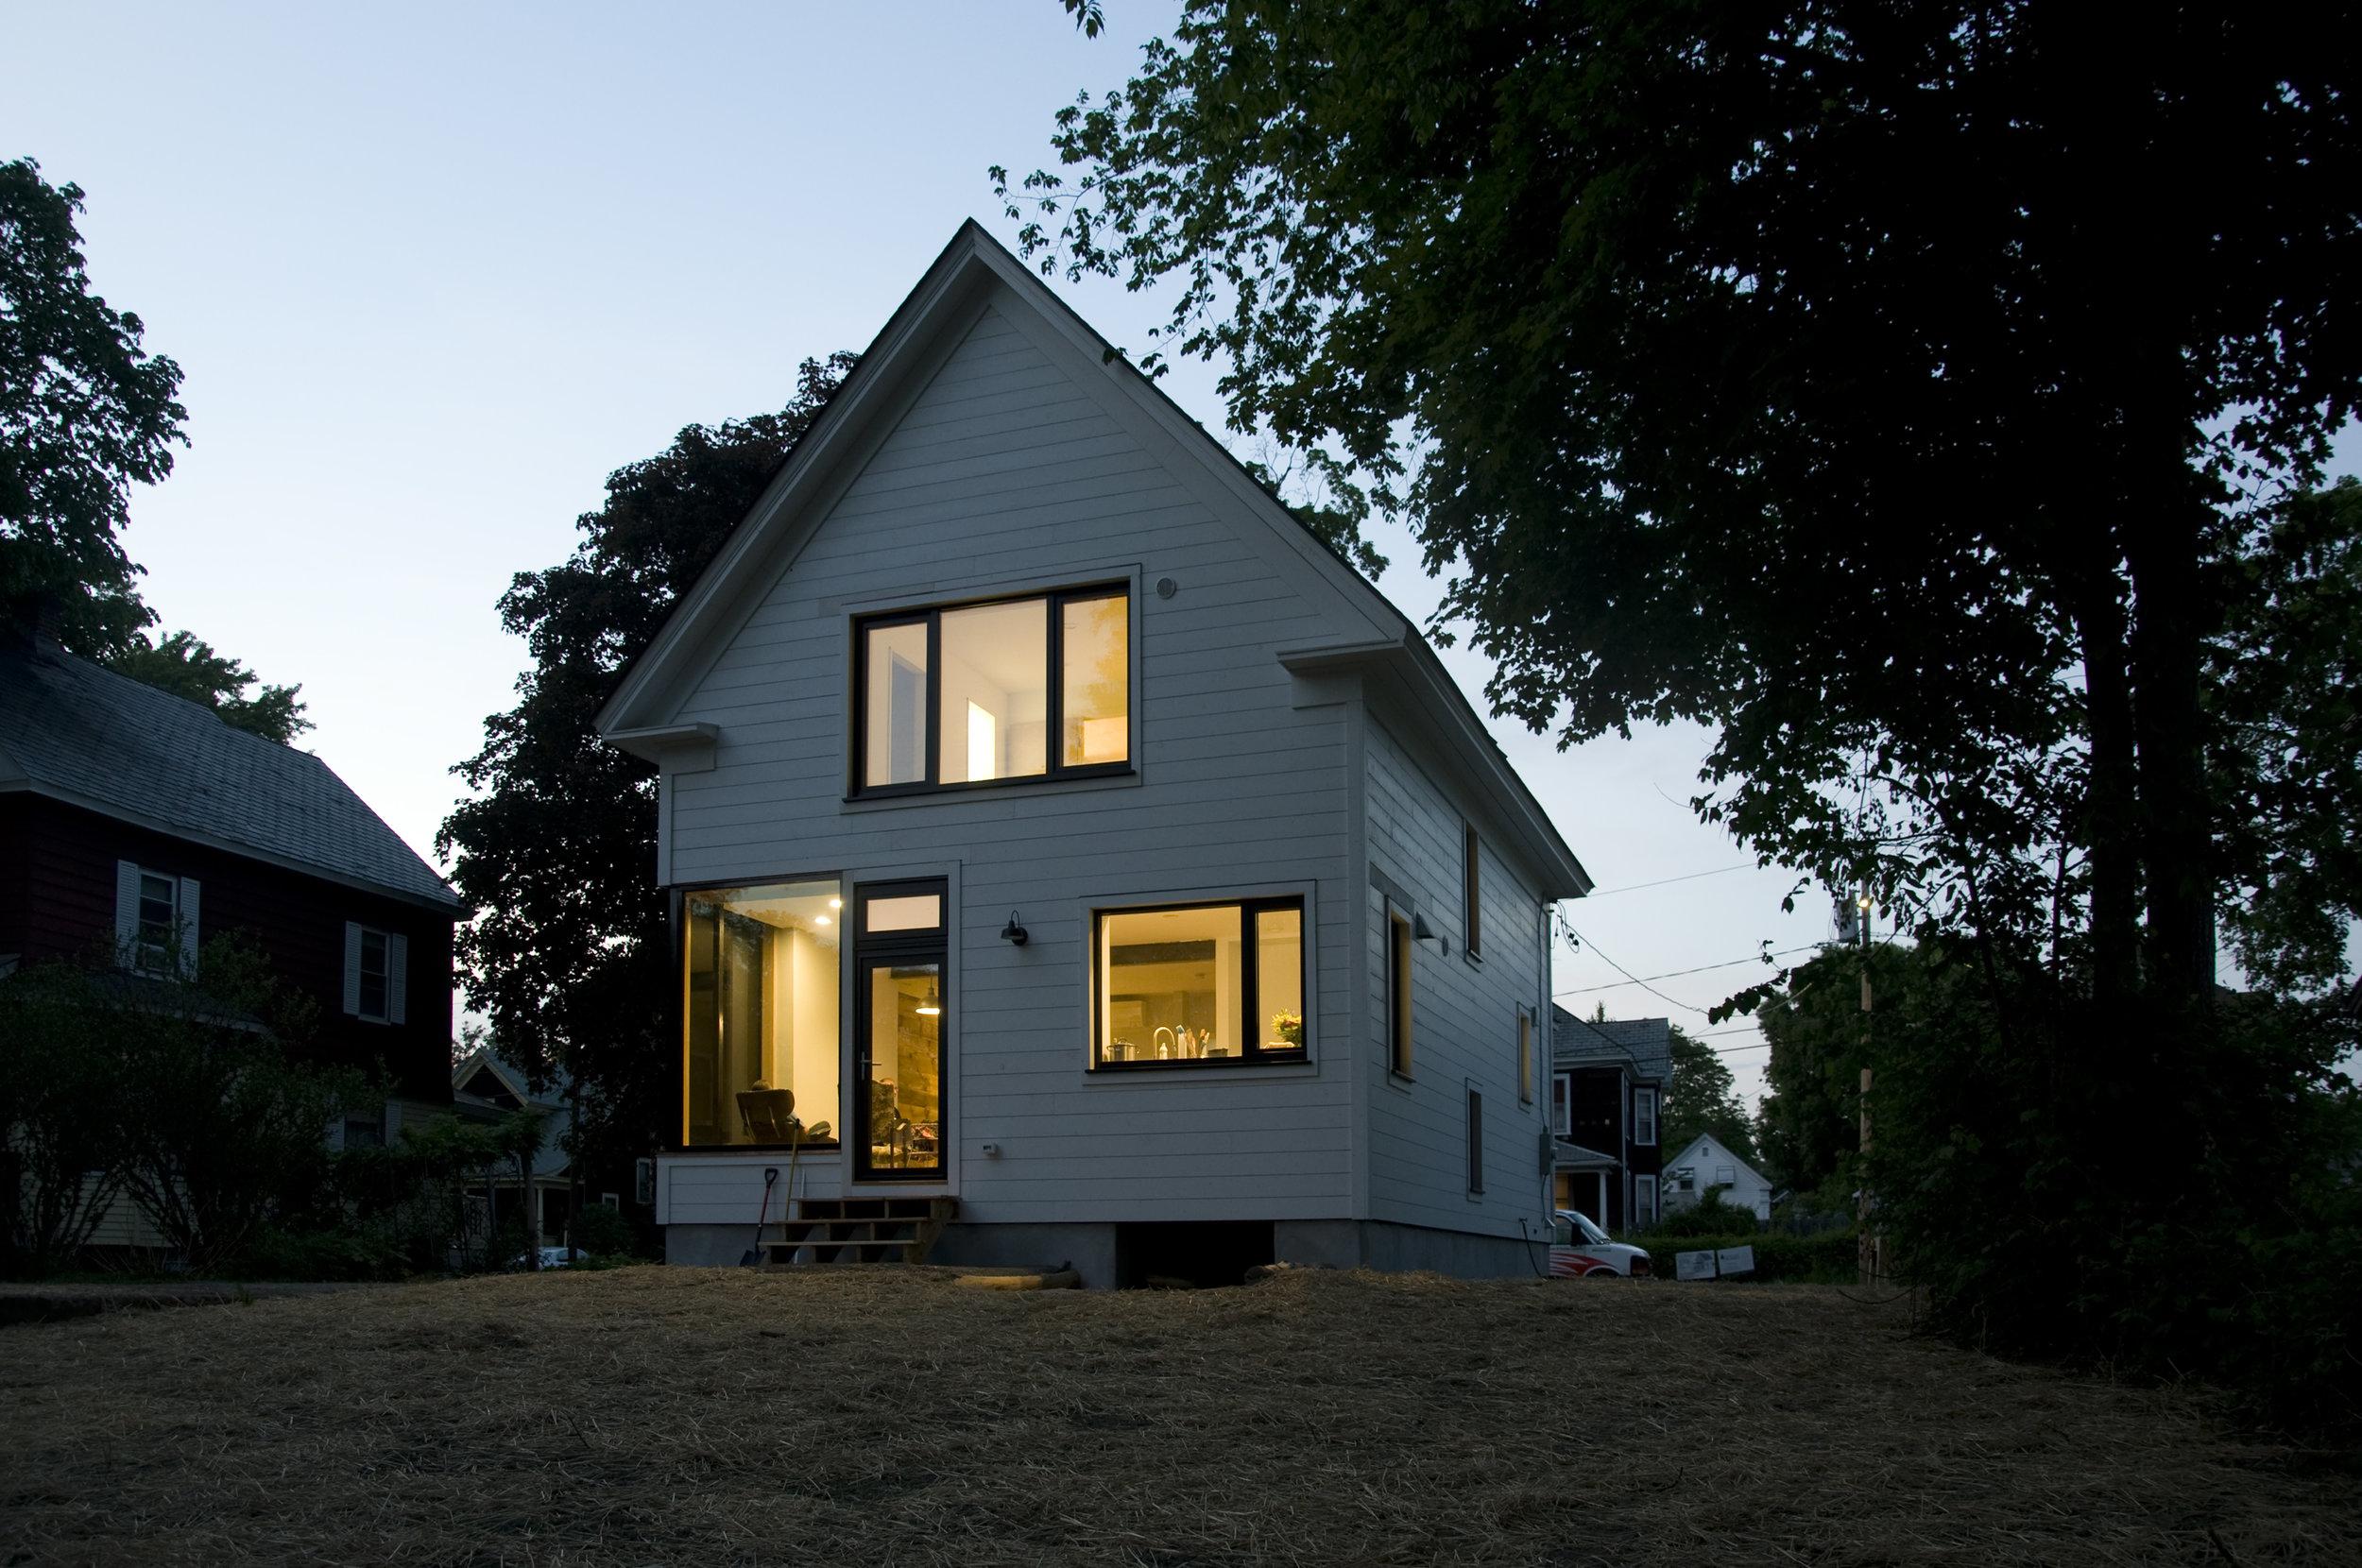 Greenfield High Performance Home - Robert Swinburne Architect - Vermont Natural Homes